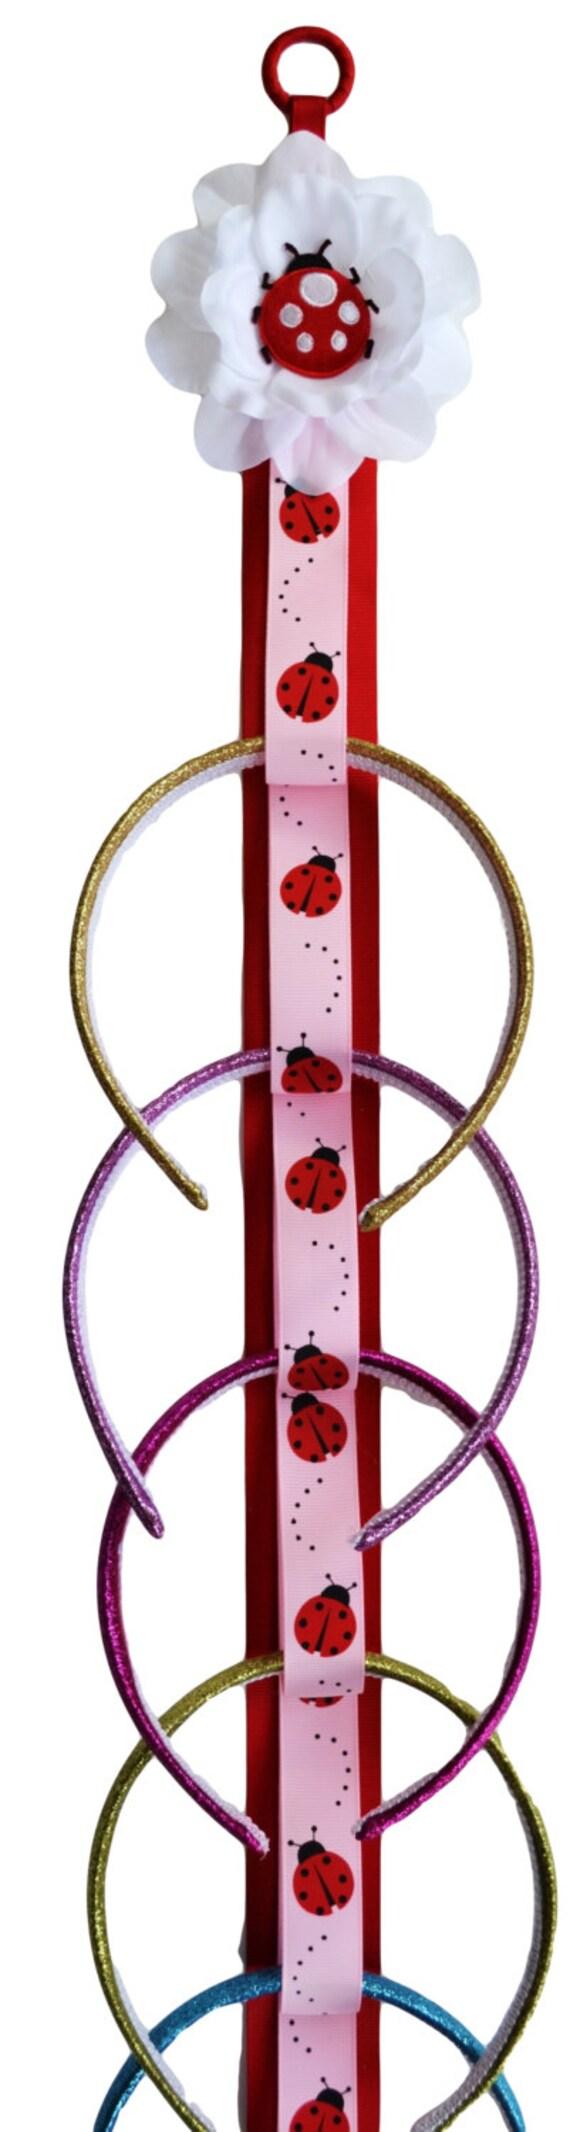 Hanging Wall Decor With Ribbon : Ladybug ribbon wall hanging headband holder girls room decor